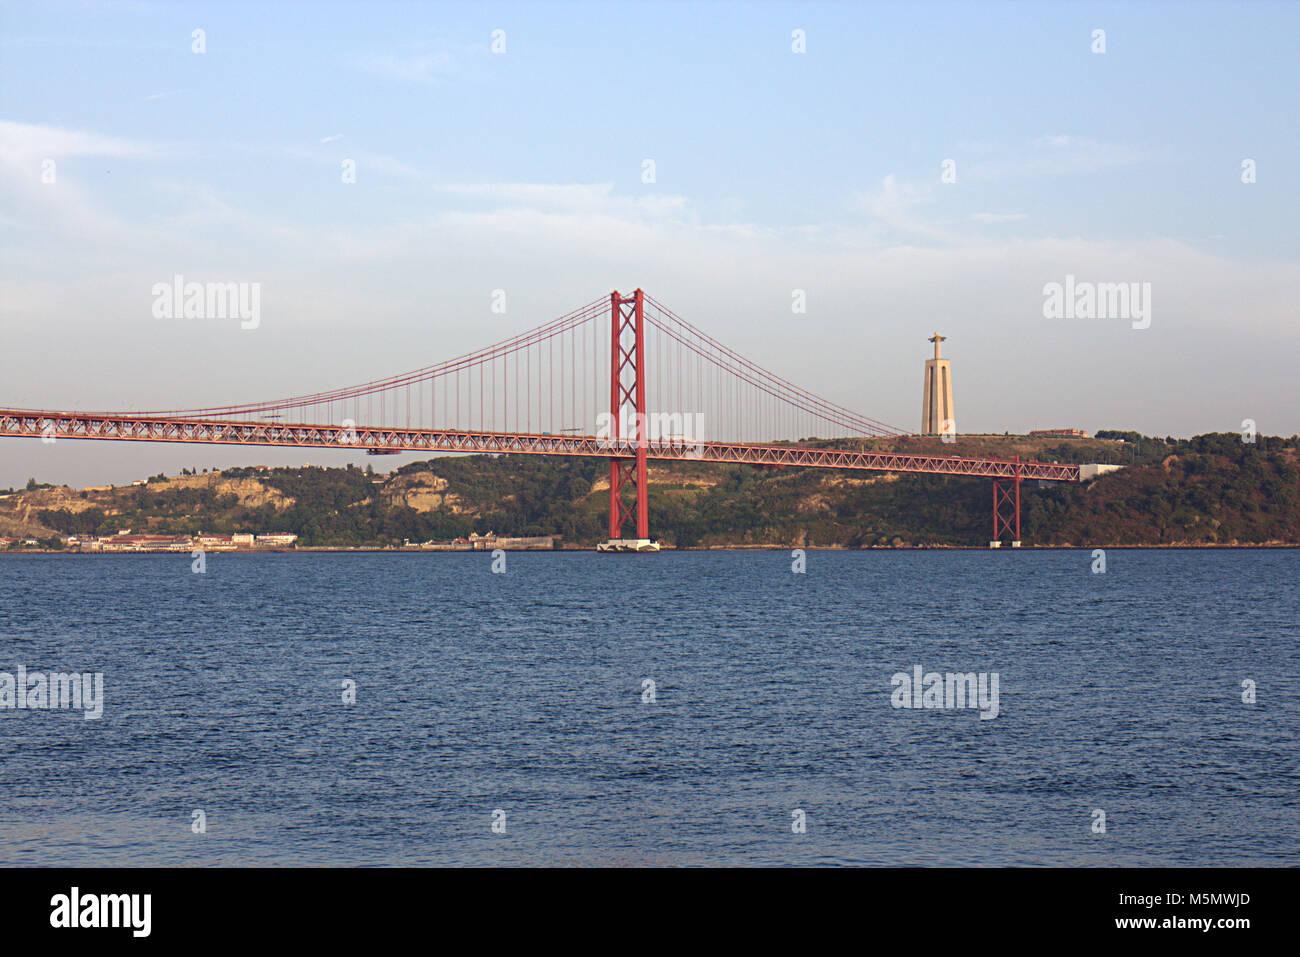 The 25 de Abril Bridge of Lisbon, Almada, over Tejo river, Lisbon portugal Stock Photo